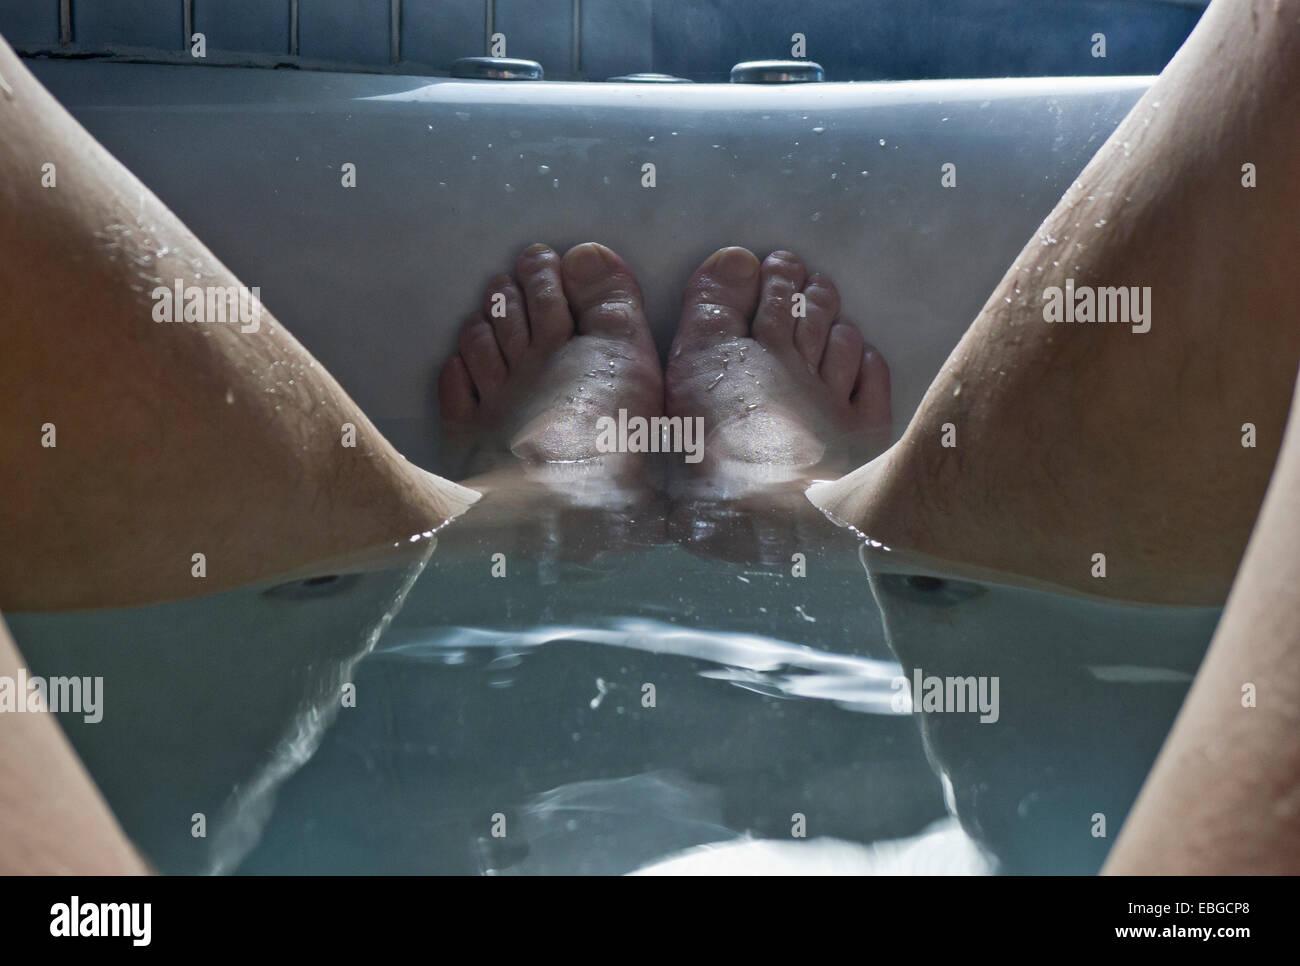 A man's feet in the bathtub. - Stock Image